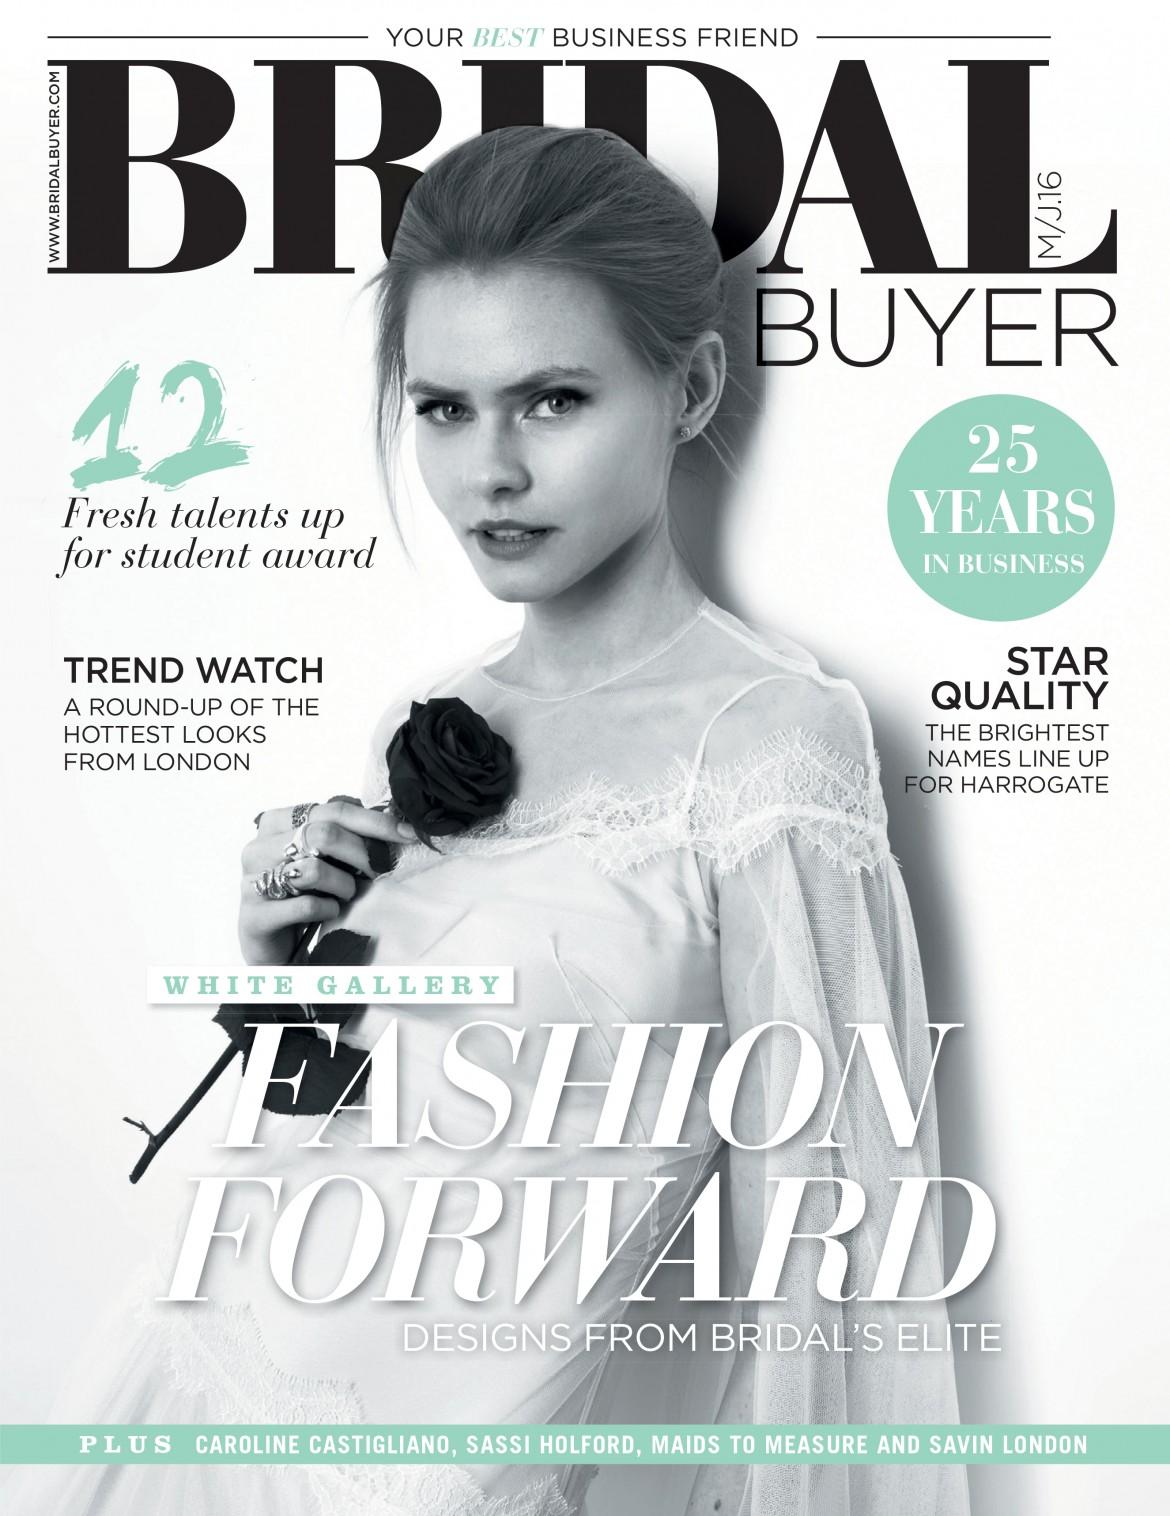 BRIDAL BUYER COVER designer wedding dresses by Caroline Castigliano